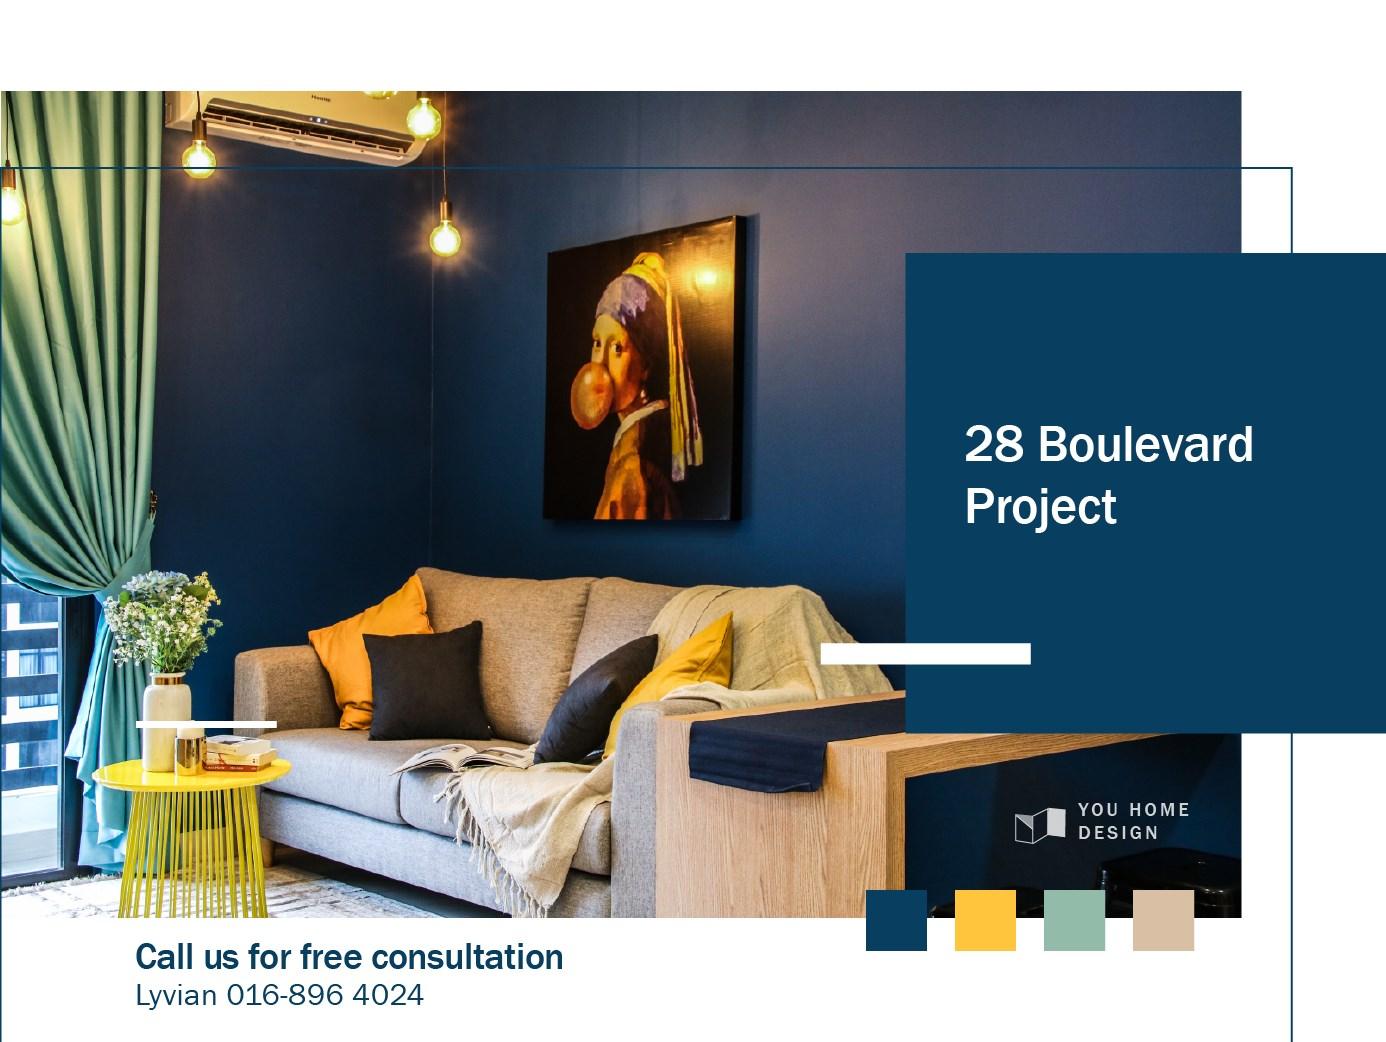 Renovation for 28 Boulevard1